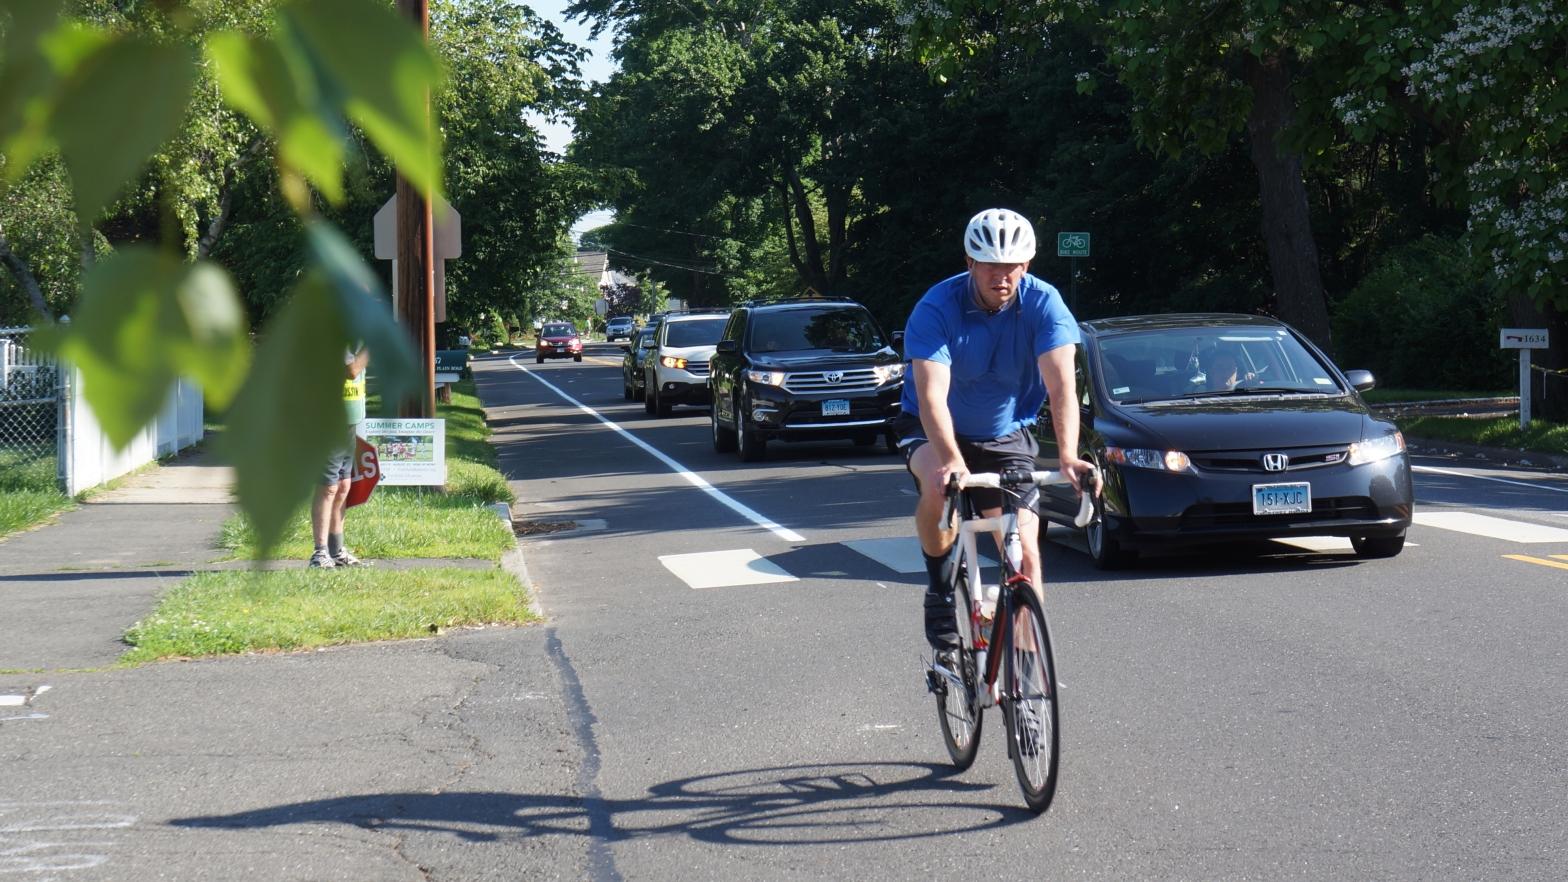 Bicyclist on Mill Plain Rd.